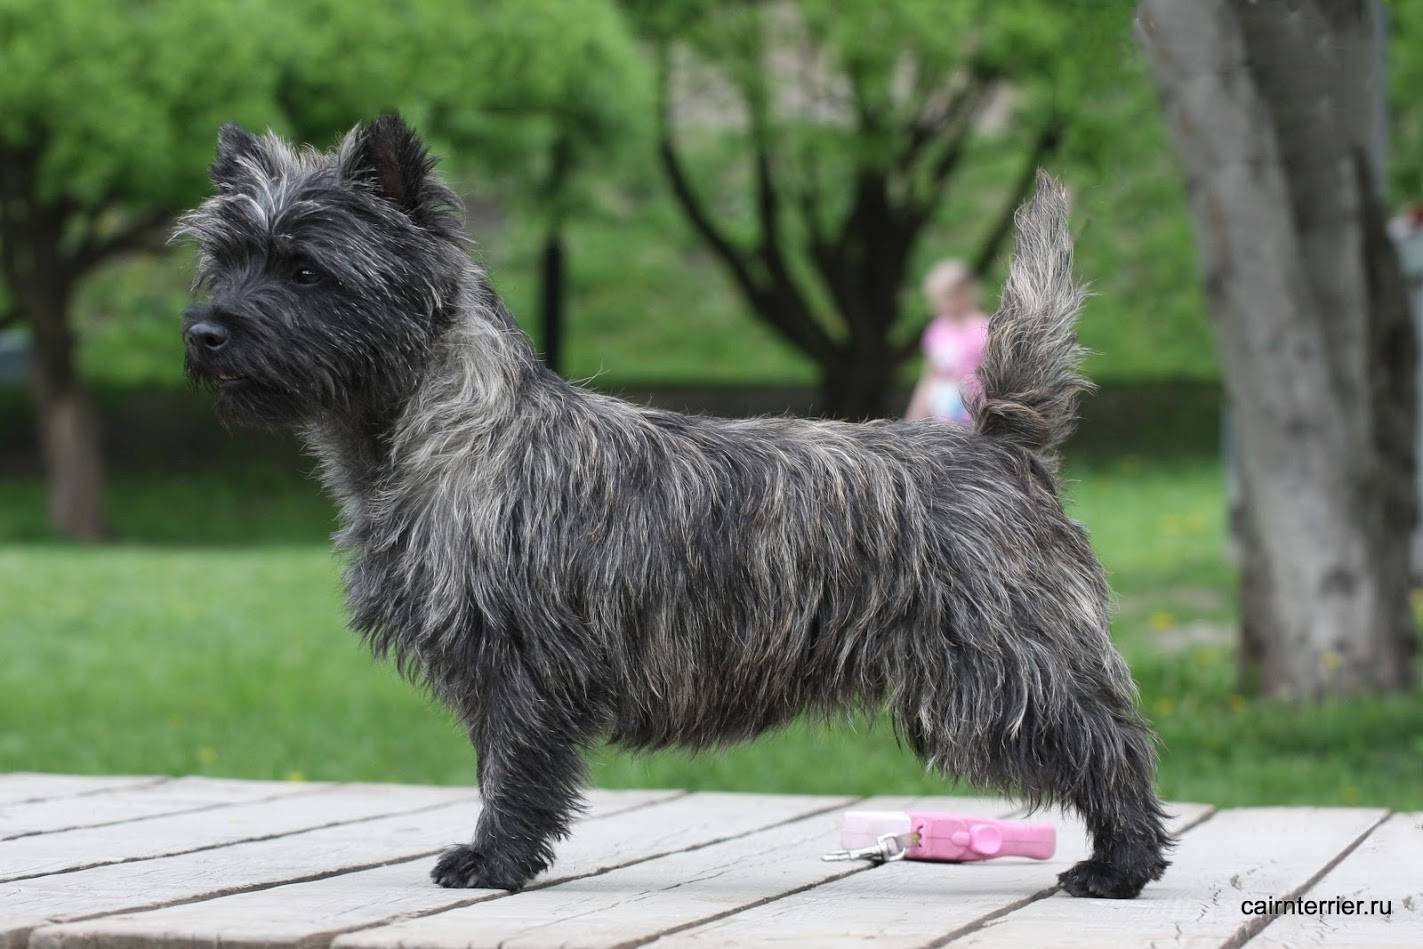 Керн-терьер: все о собаке, фото, описание породы, характер, цена